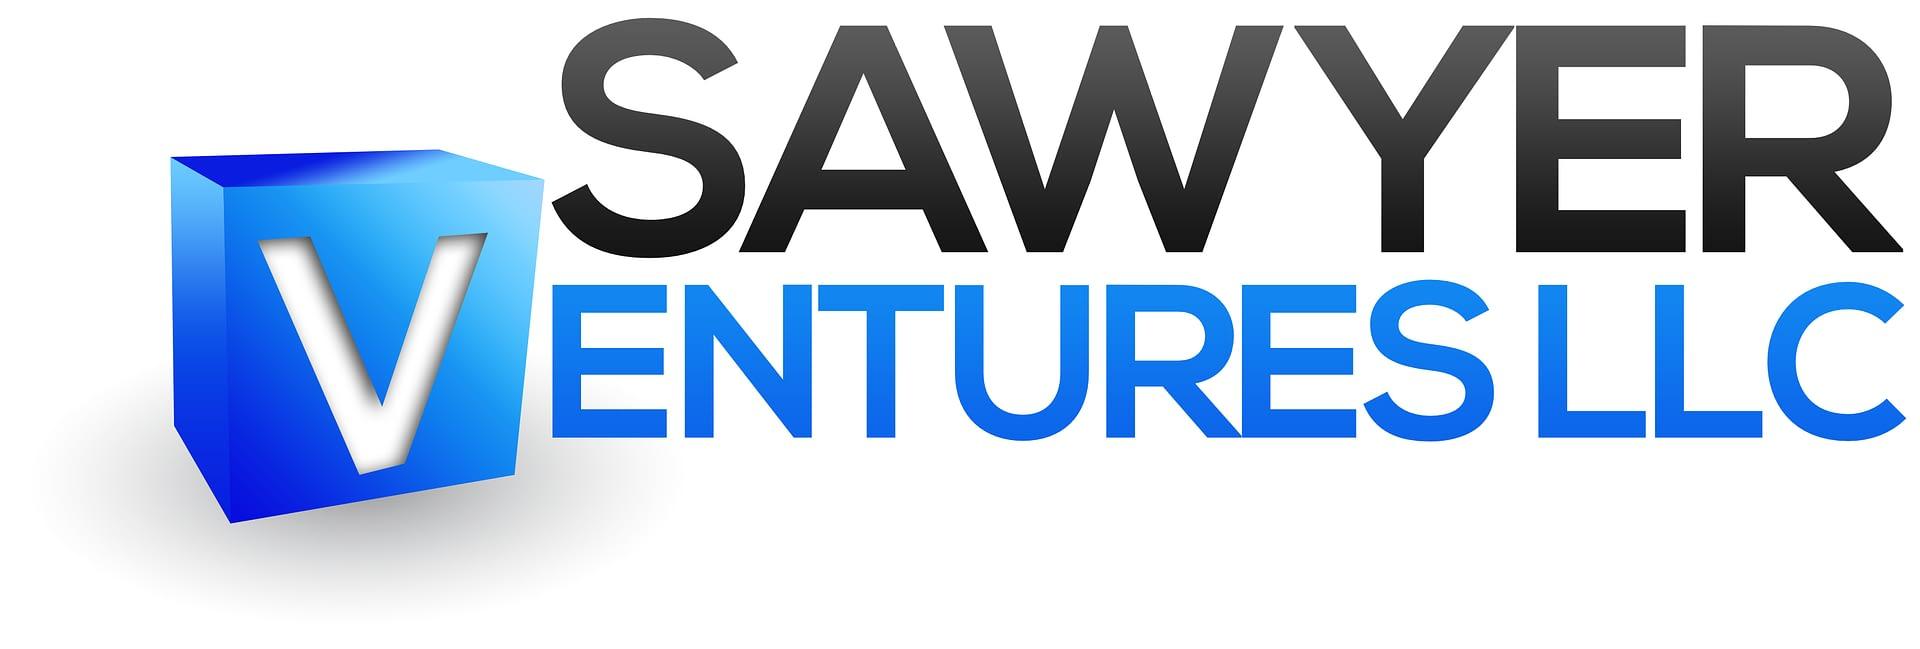 Sawyer Ventures